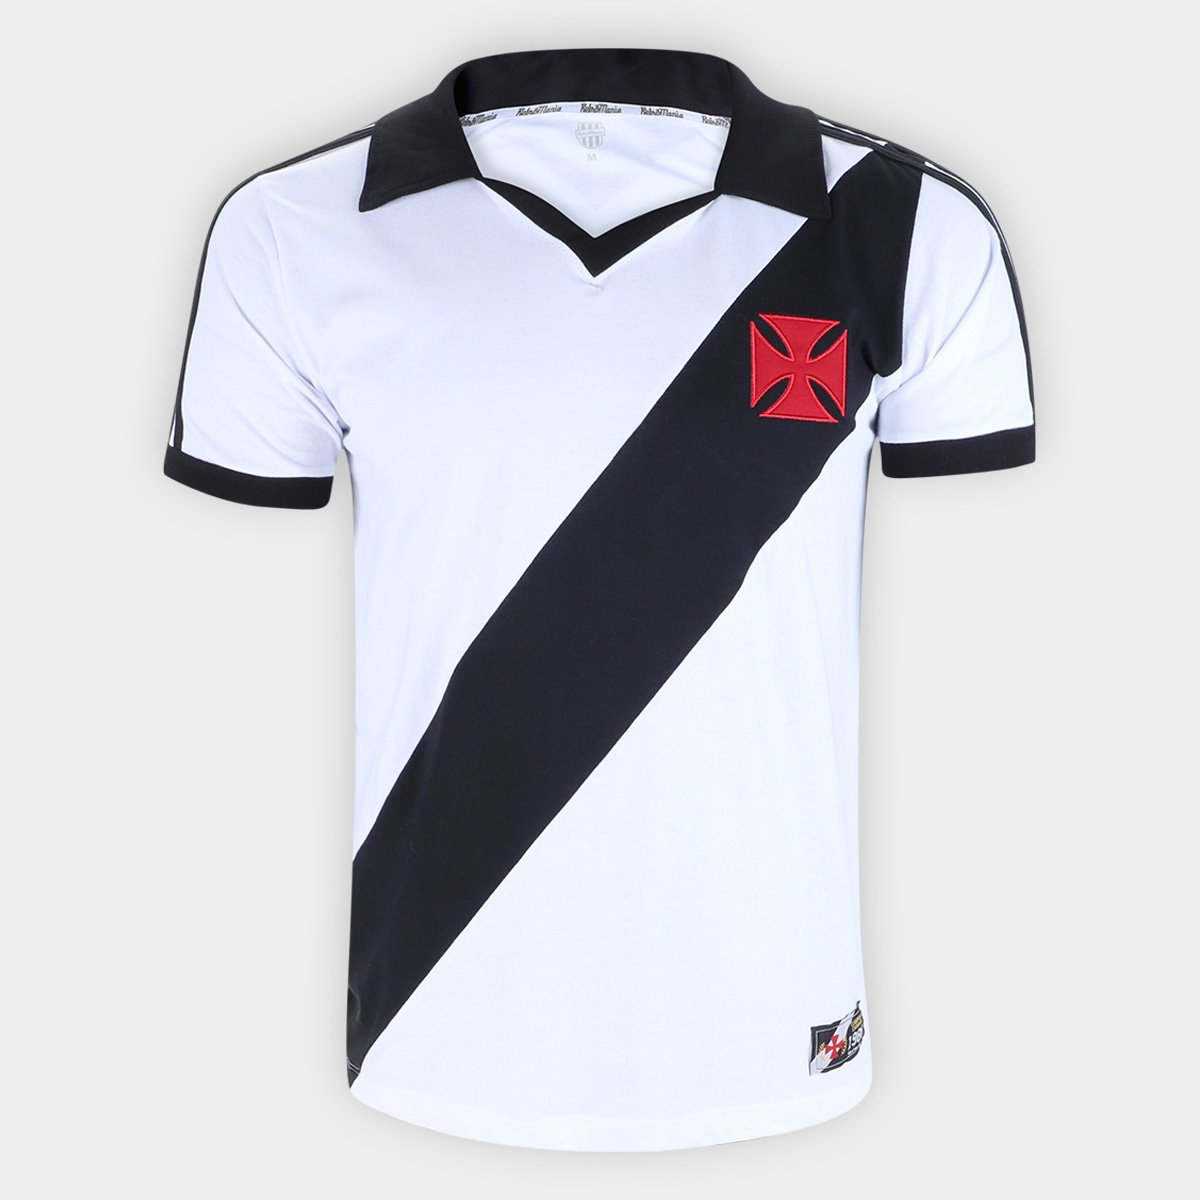 de48736c99 Camiseta Vasco Da Gama Retro Mania 1988 Masculina - Branco e Preto ...